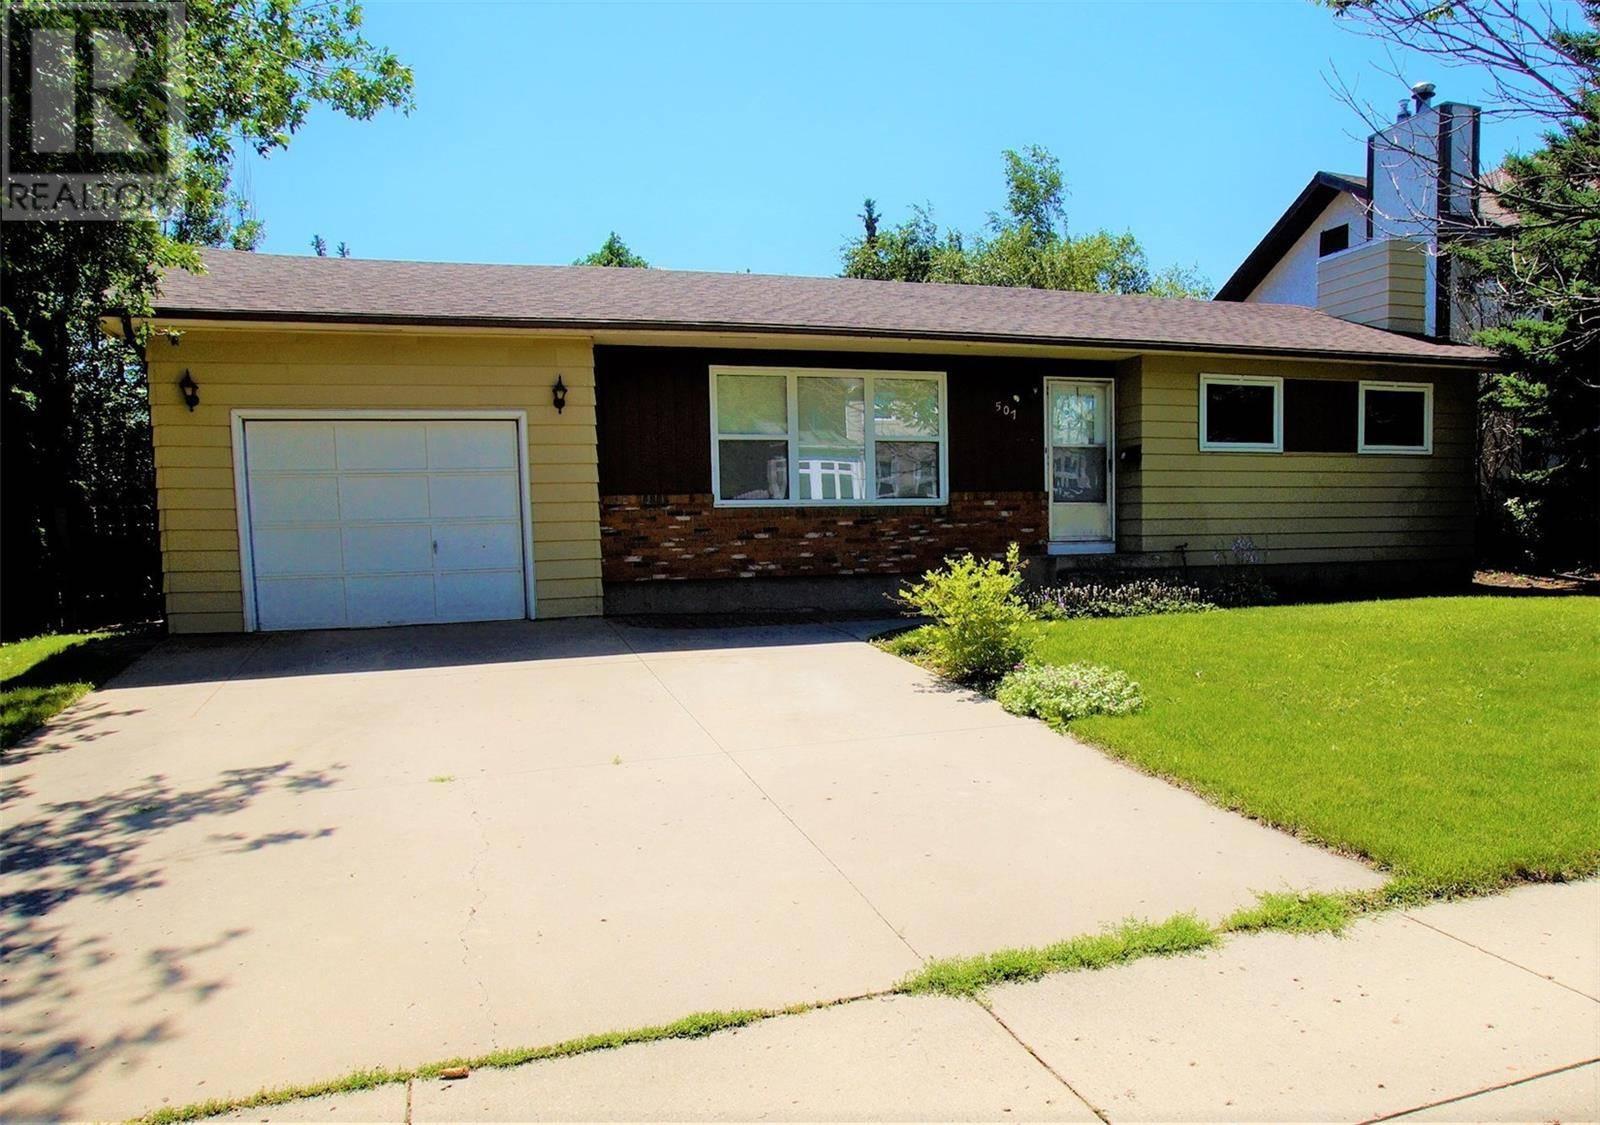 House for sale at 507 Ae Adams Cres Saskatoon Saskatchewan - MLS: SK783359